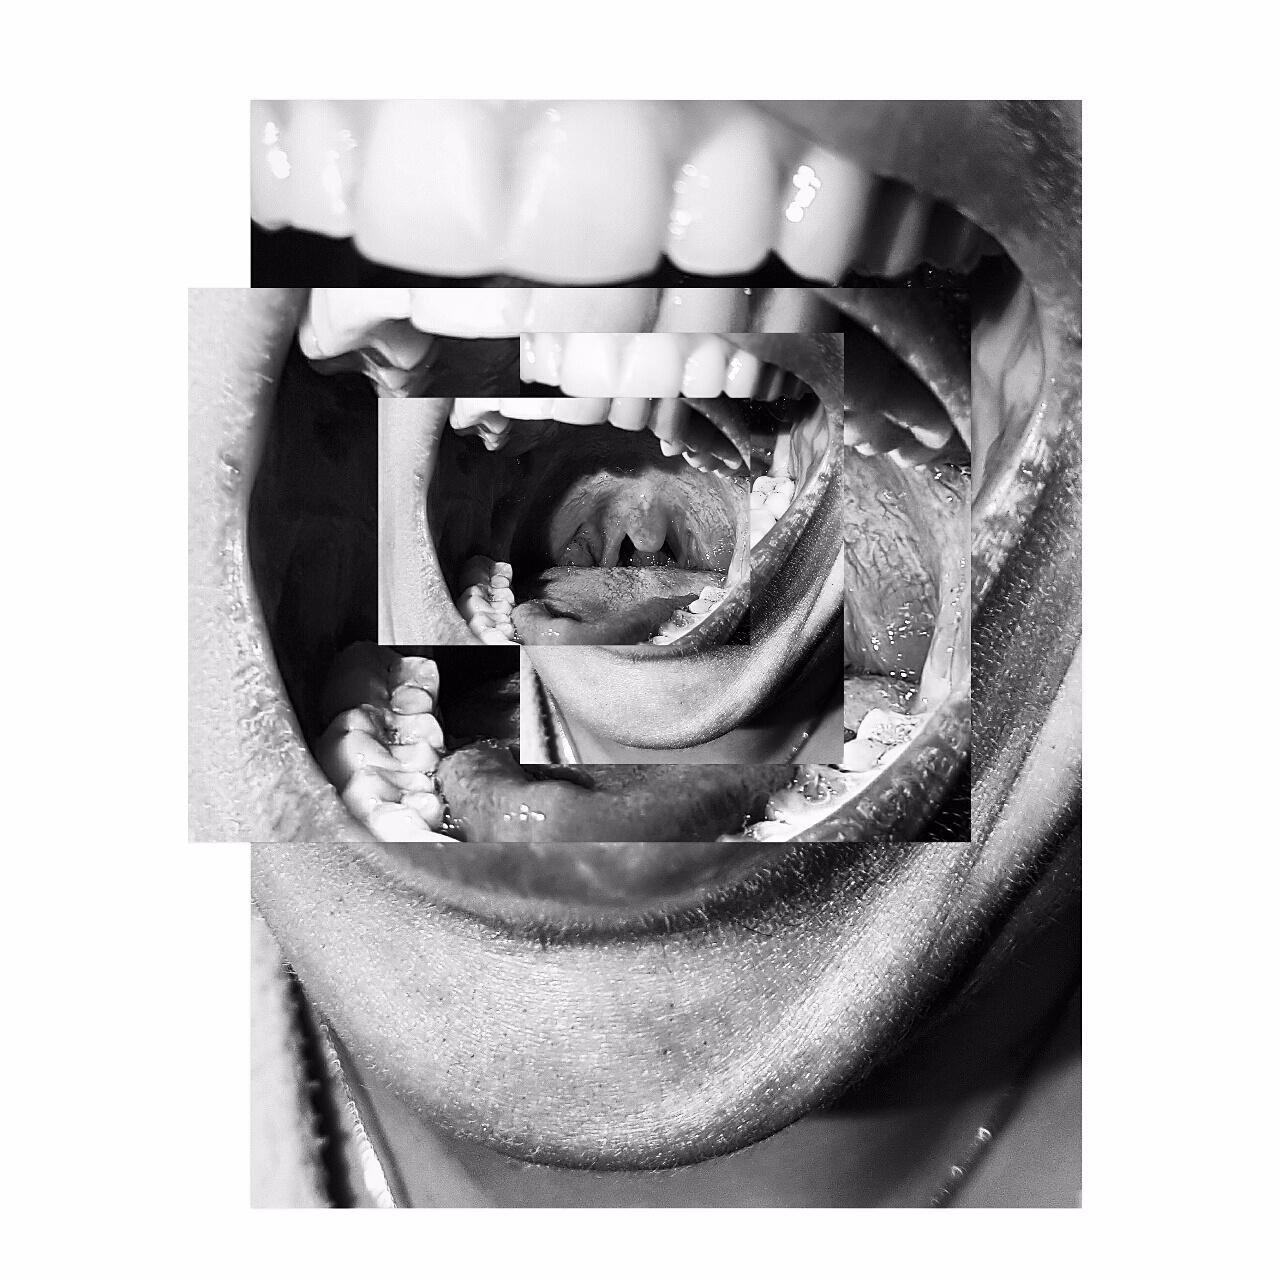 18/01/17 photography collage gr - matildes | ello